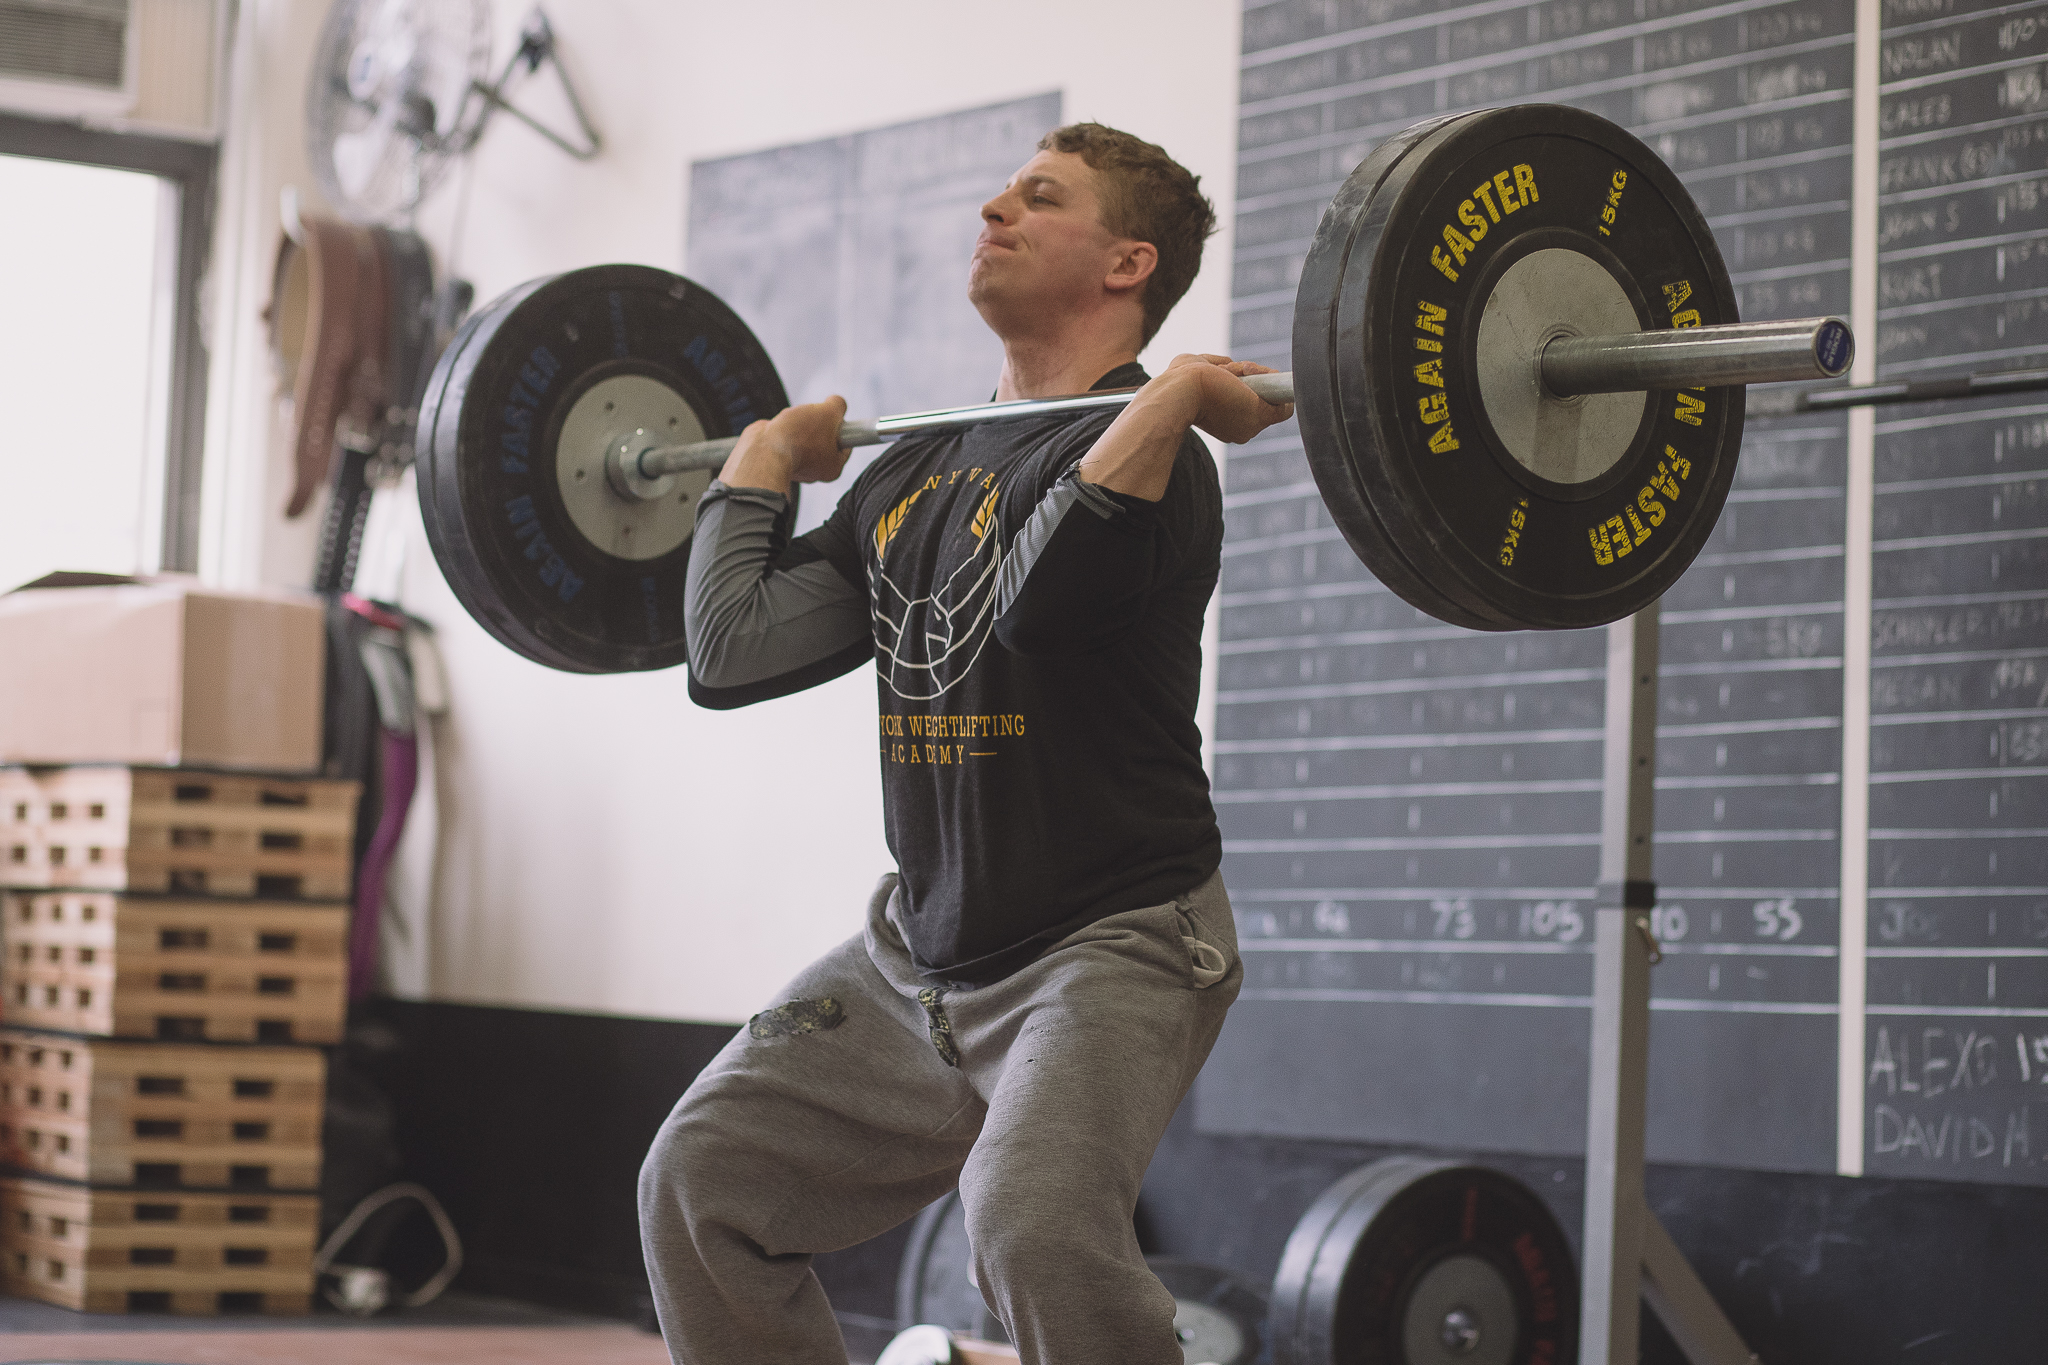 dan-casey-nywa-jdi-visit-weightlifting-coach-new-york-weightlifting-academy-3.jpg